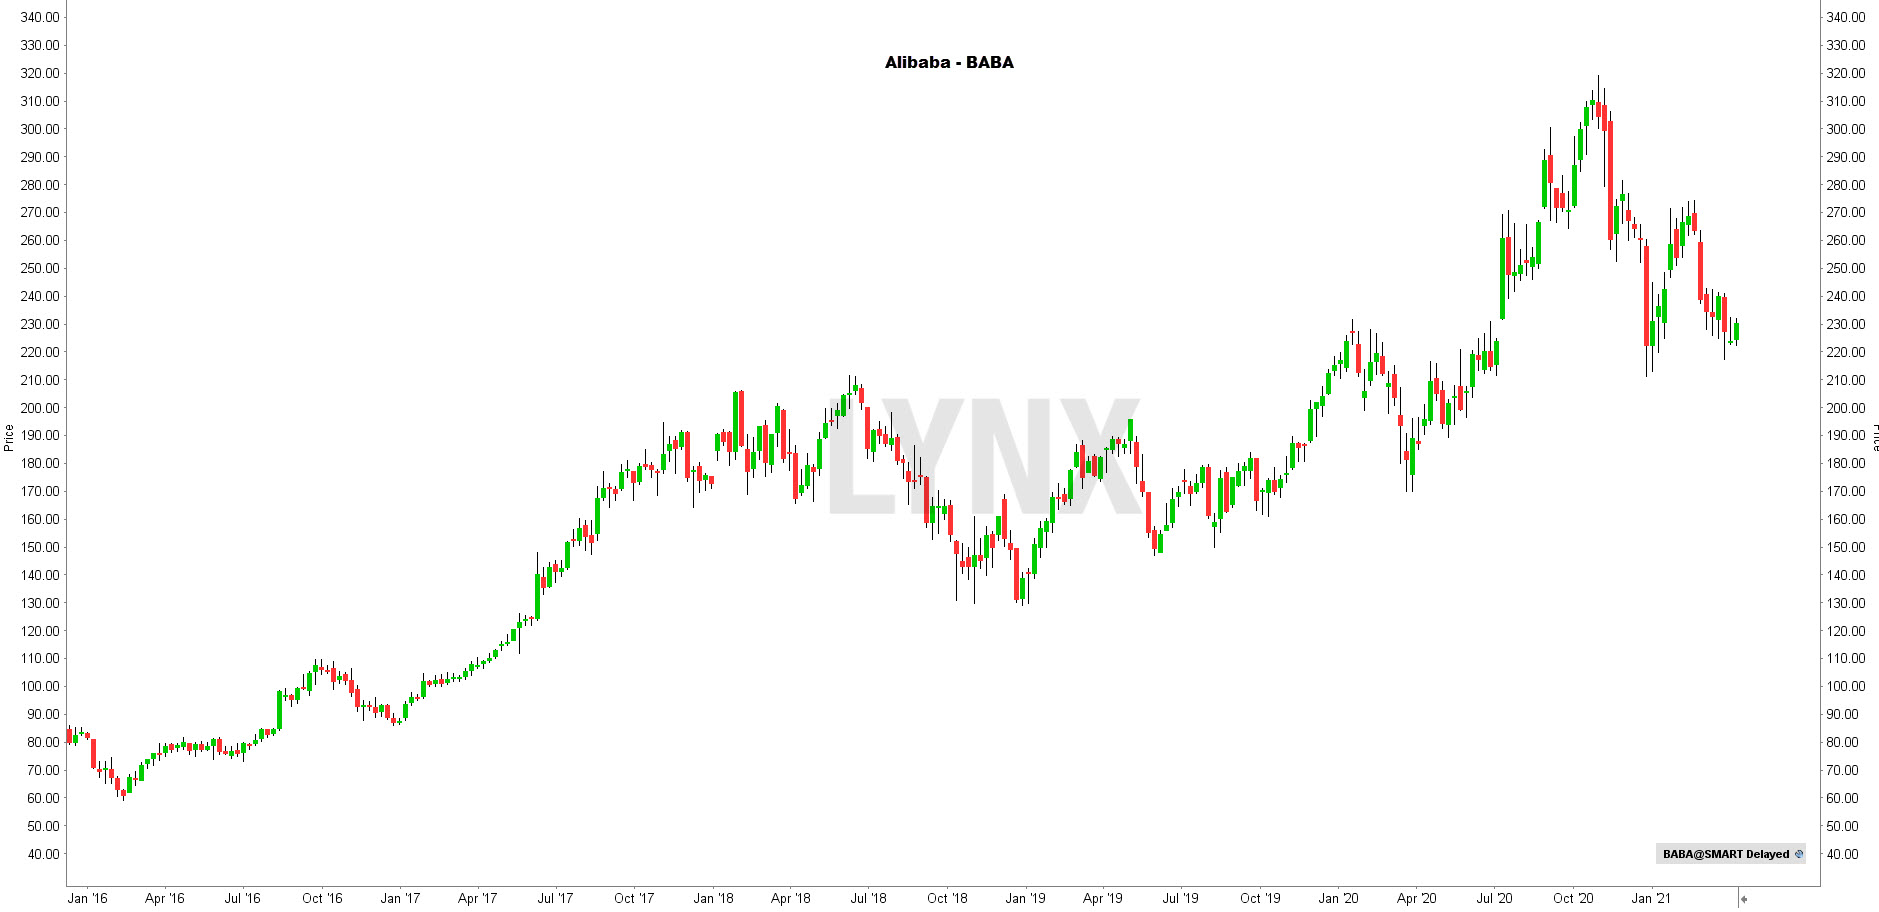 Aandeel Alibaba koers